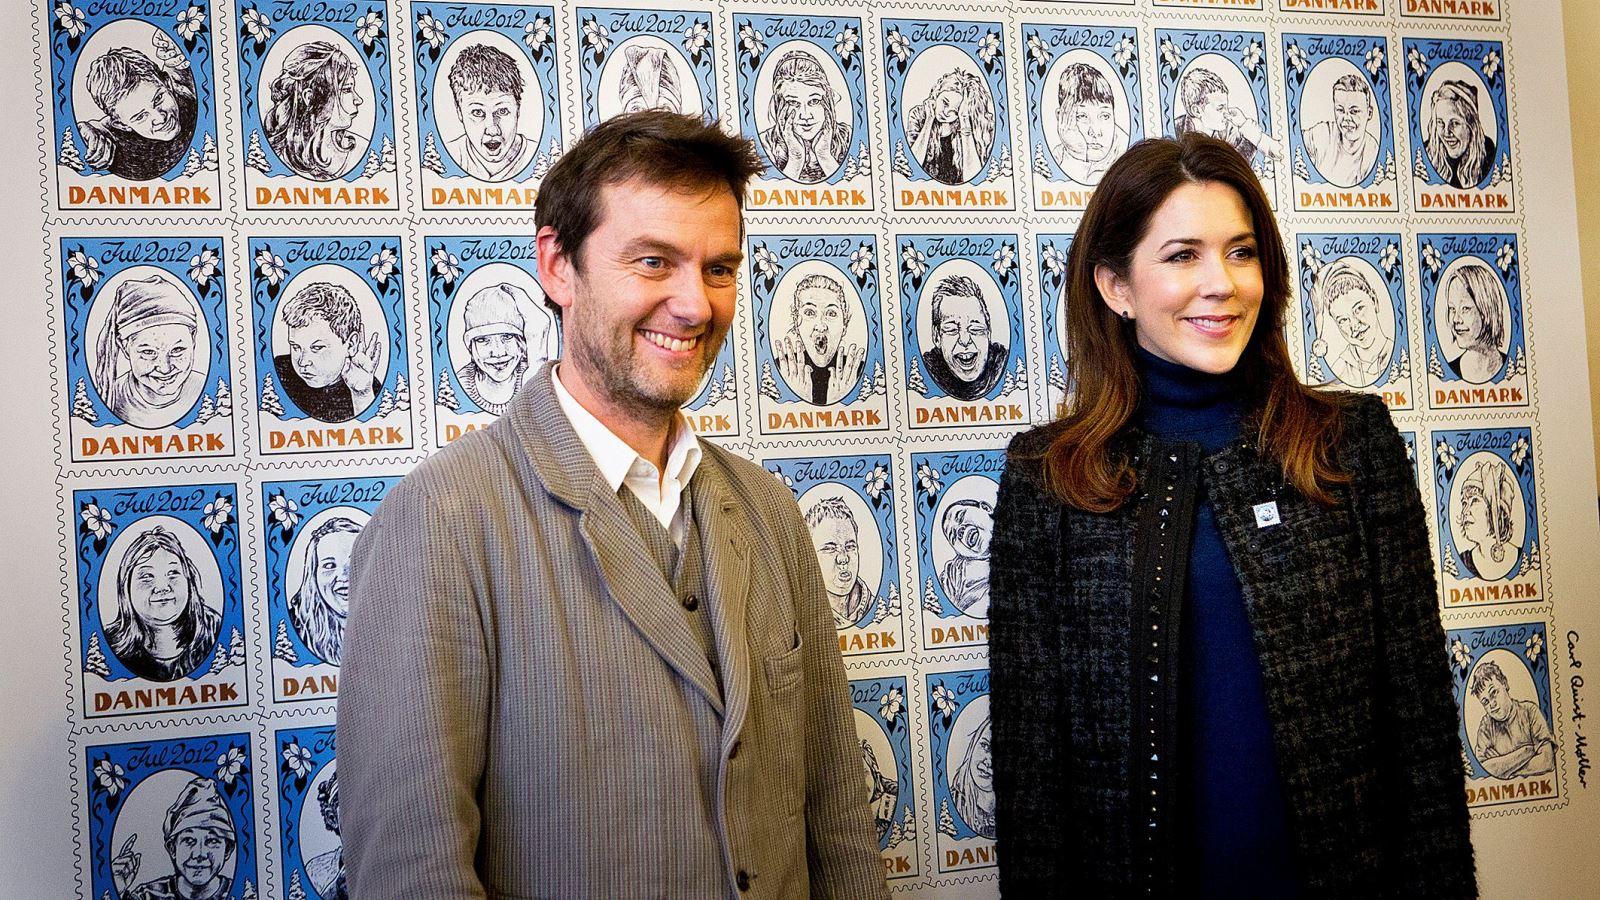 Julemaerket 2012 Carl Quist-Moeller og Kronprinsesse Mary